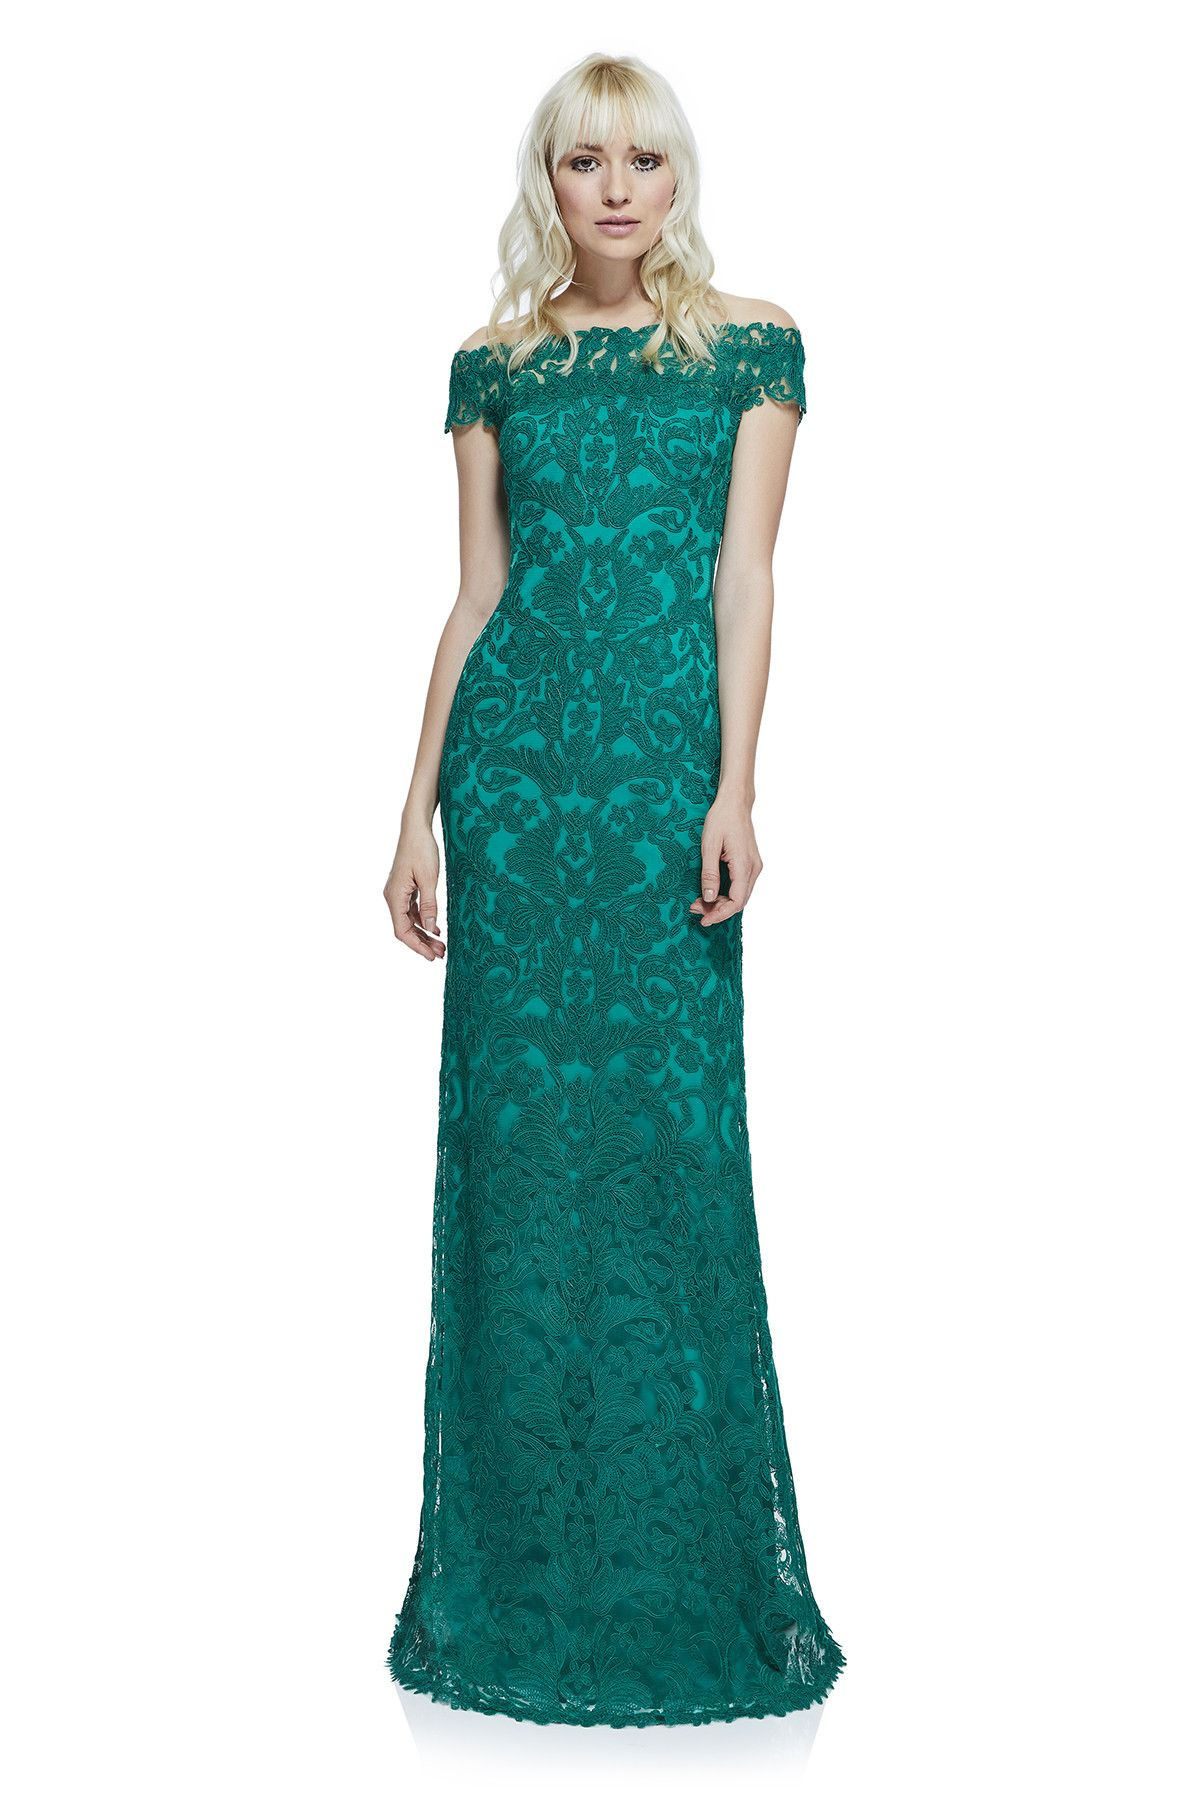 Tadashi Shoji - Dupre Off-The-Shoulder Gown | Gowns | Pinterest ...